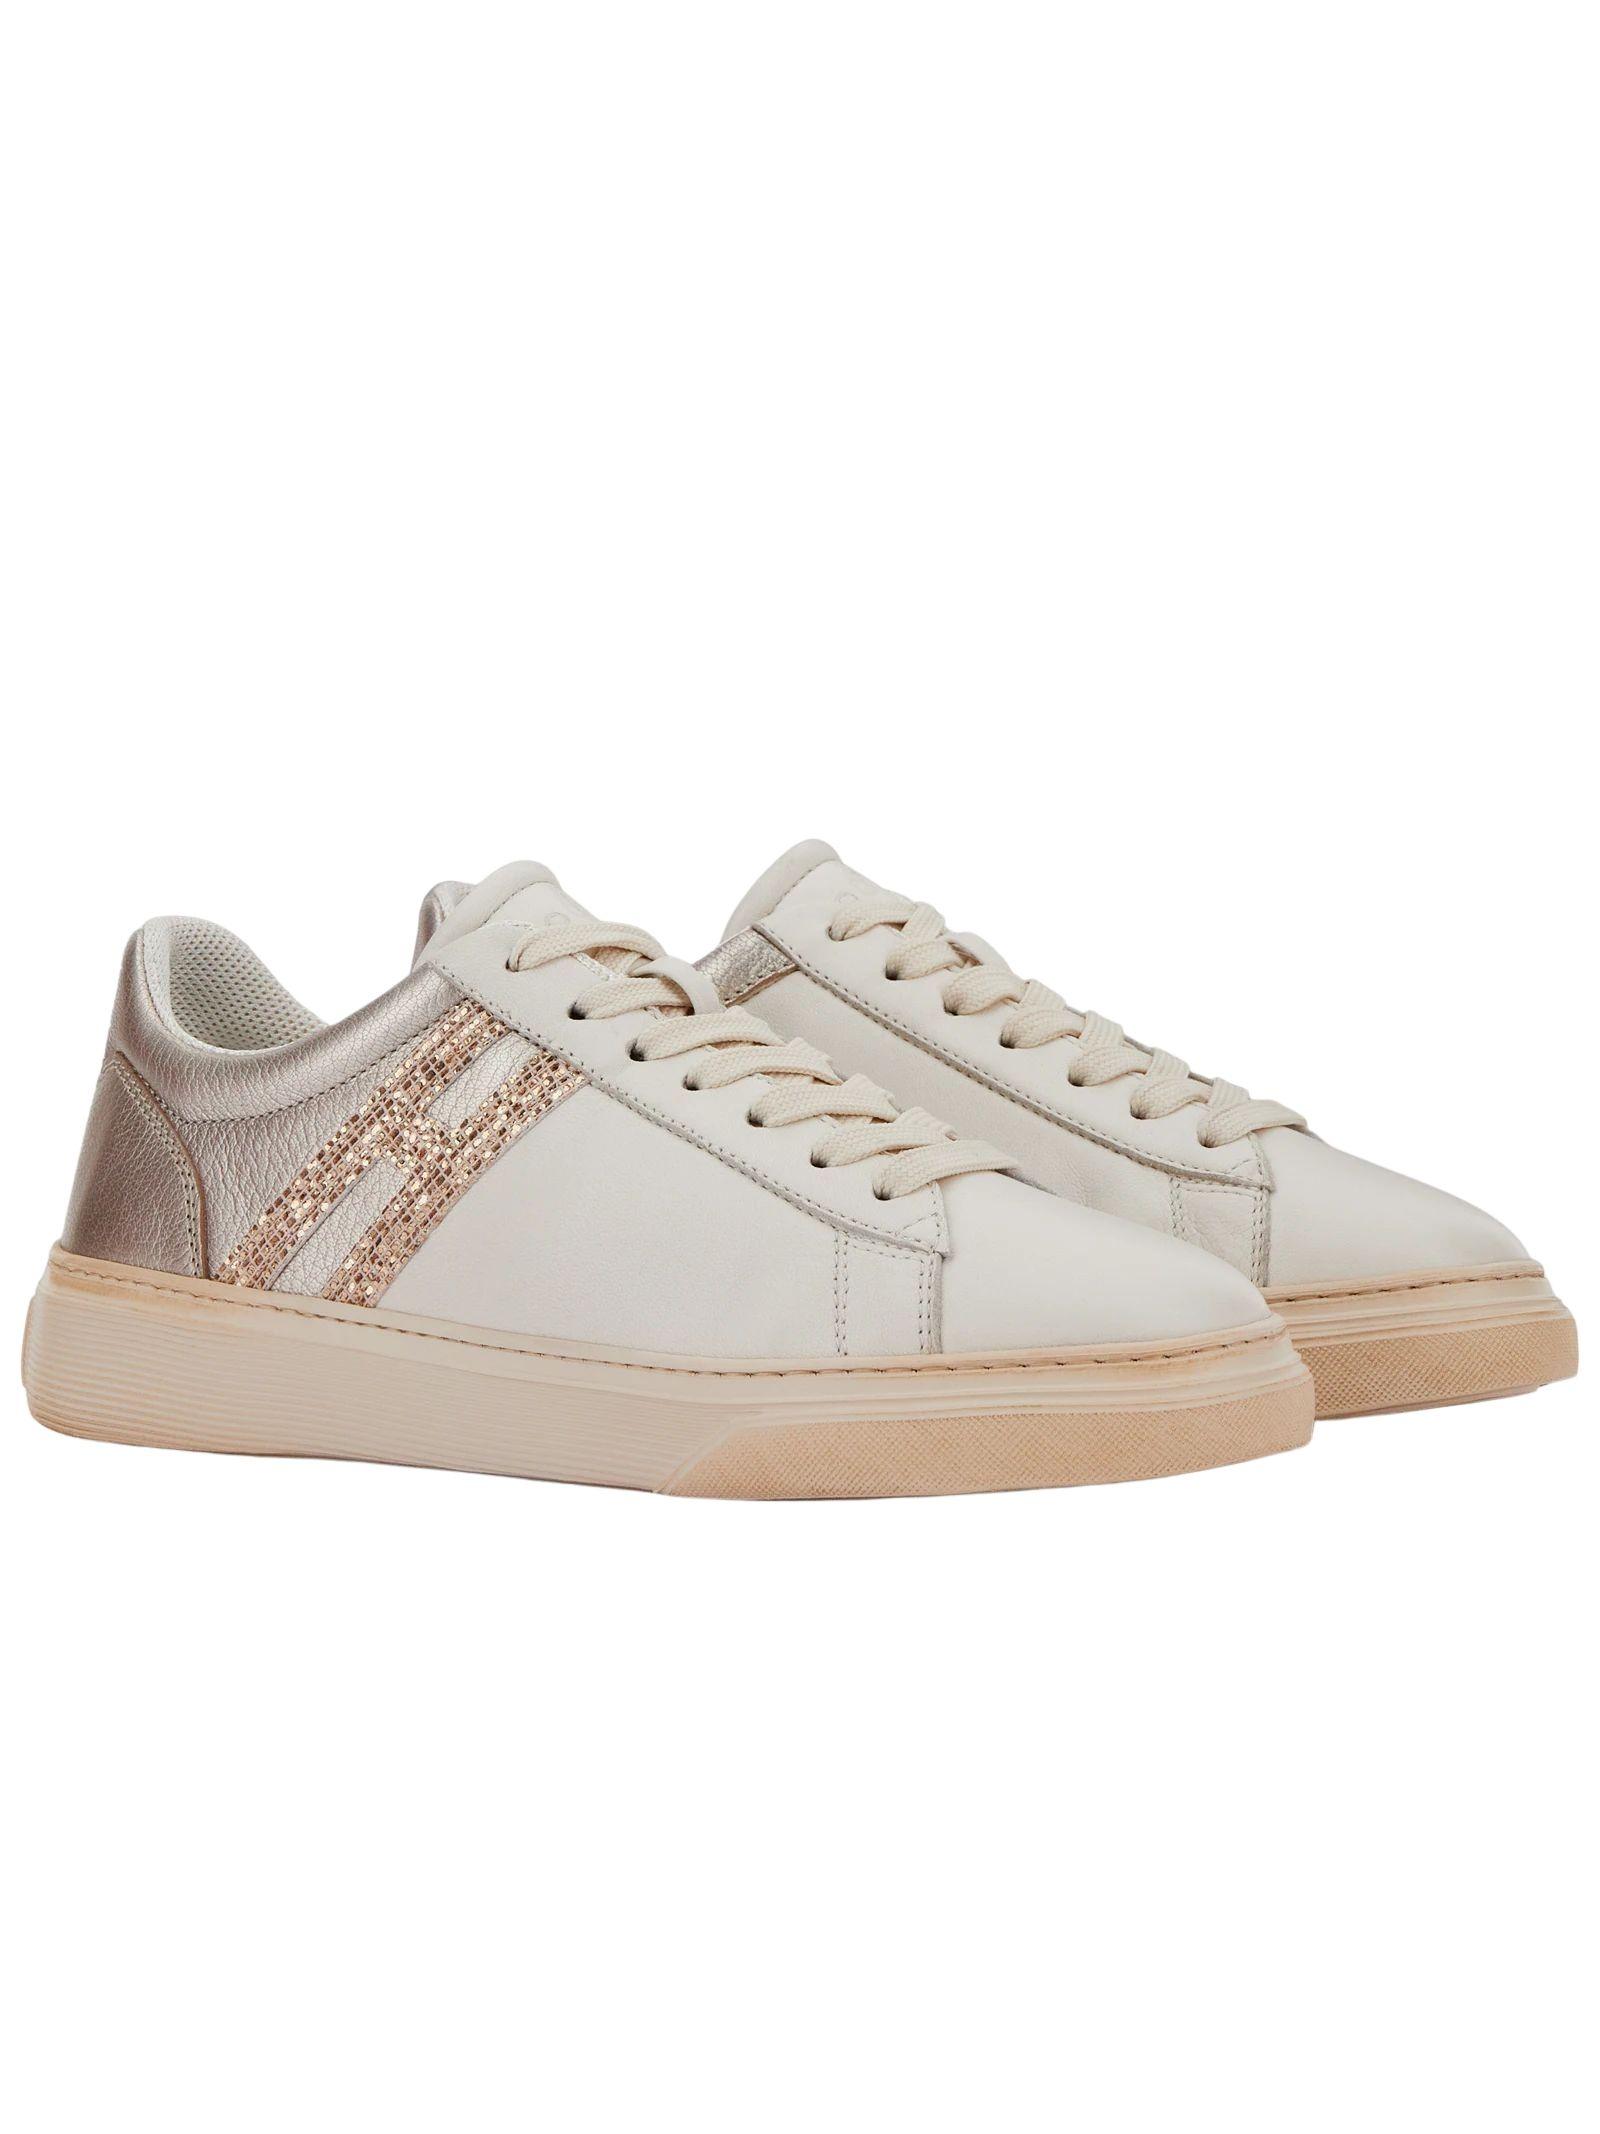 HOGAN | Shoes | HXW3650J976Q9A0RXC